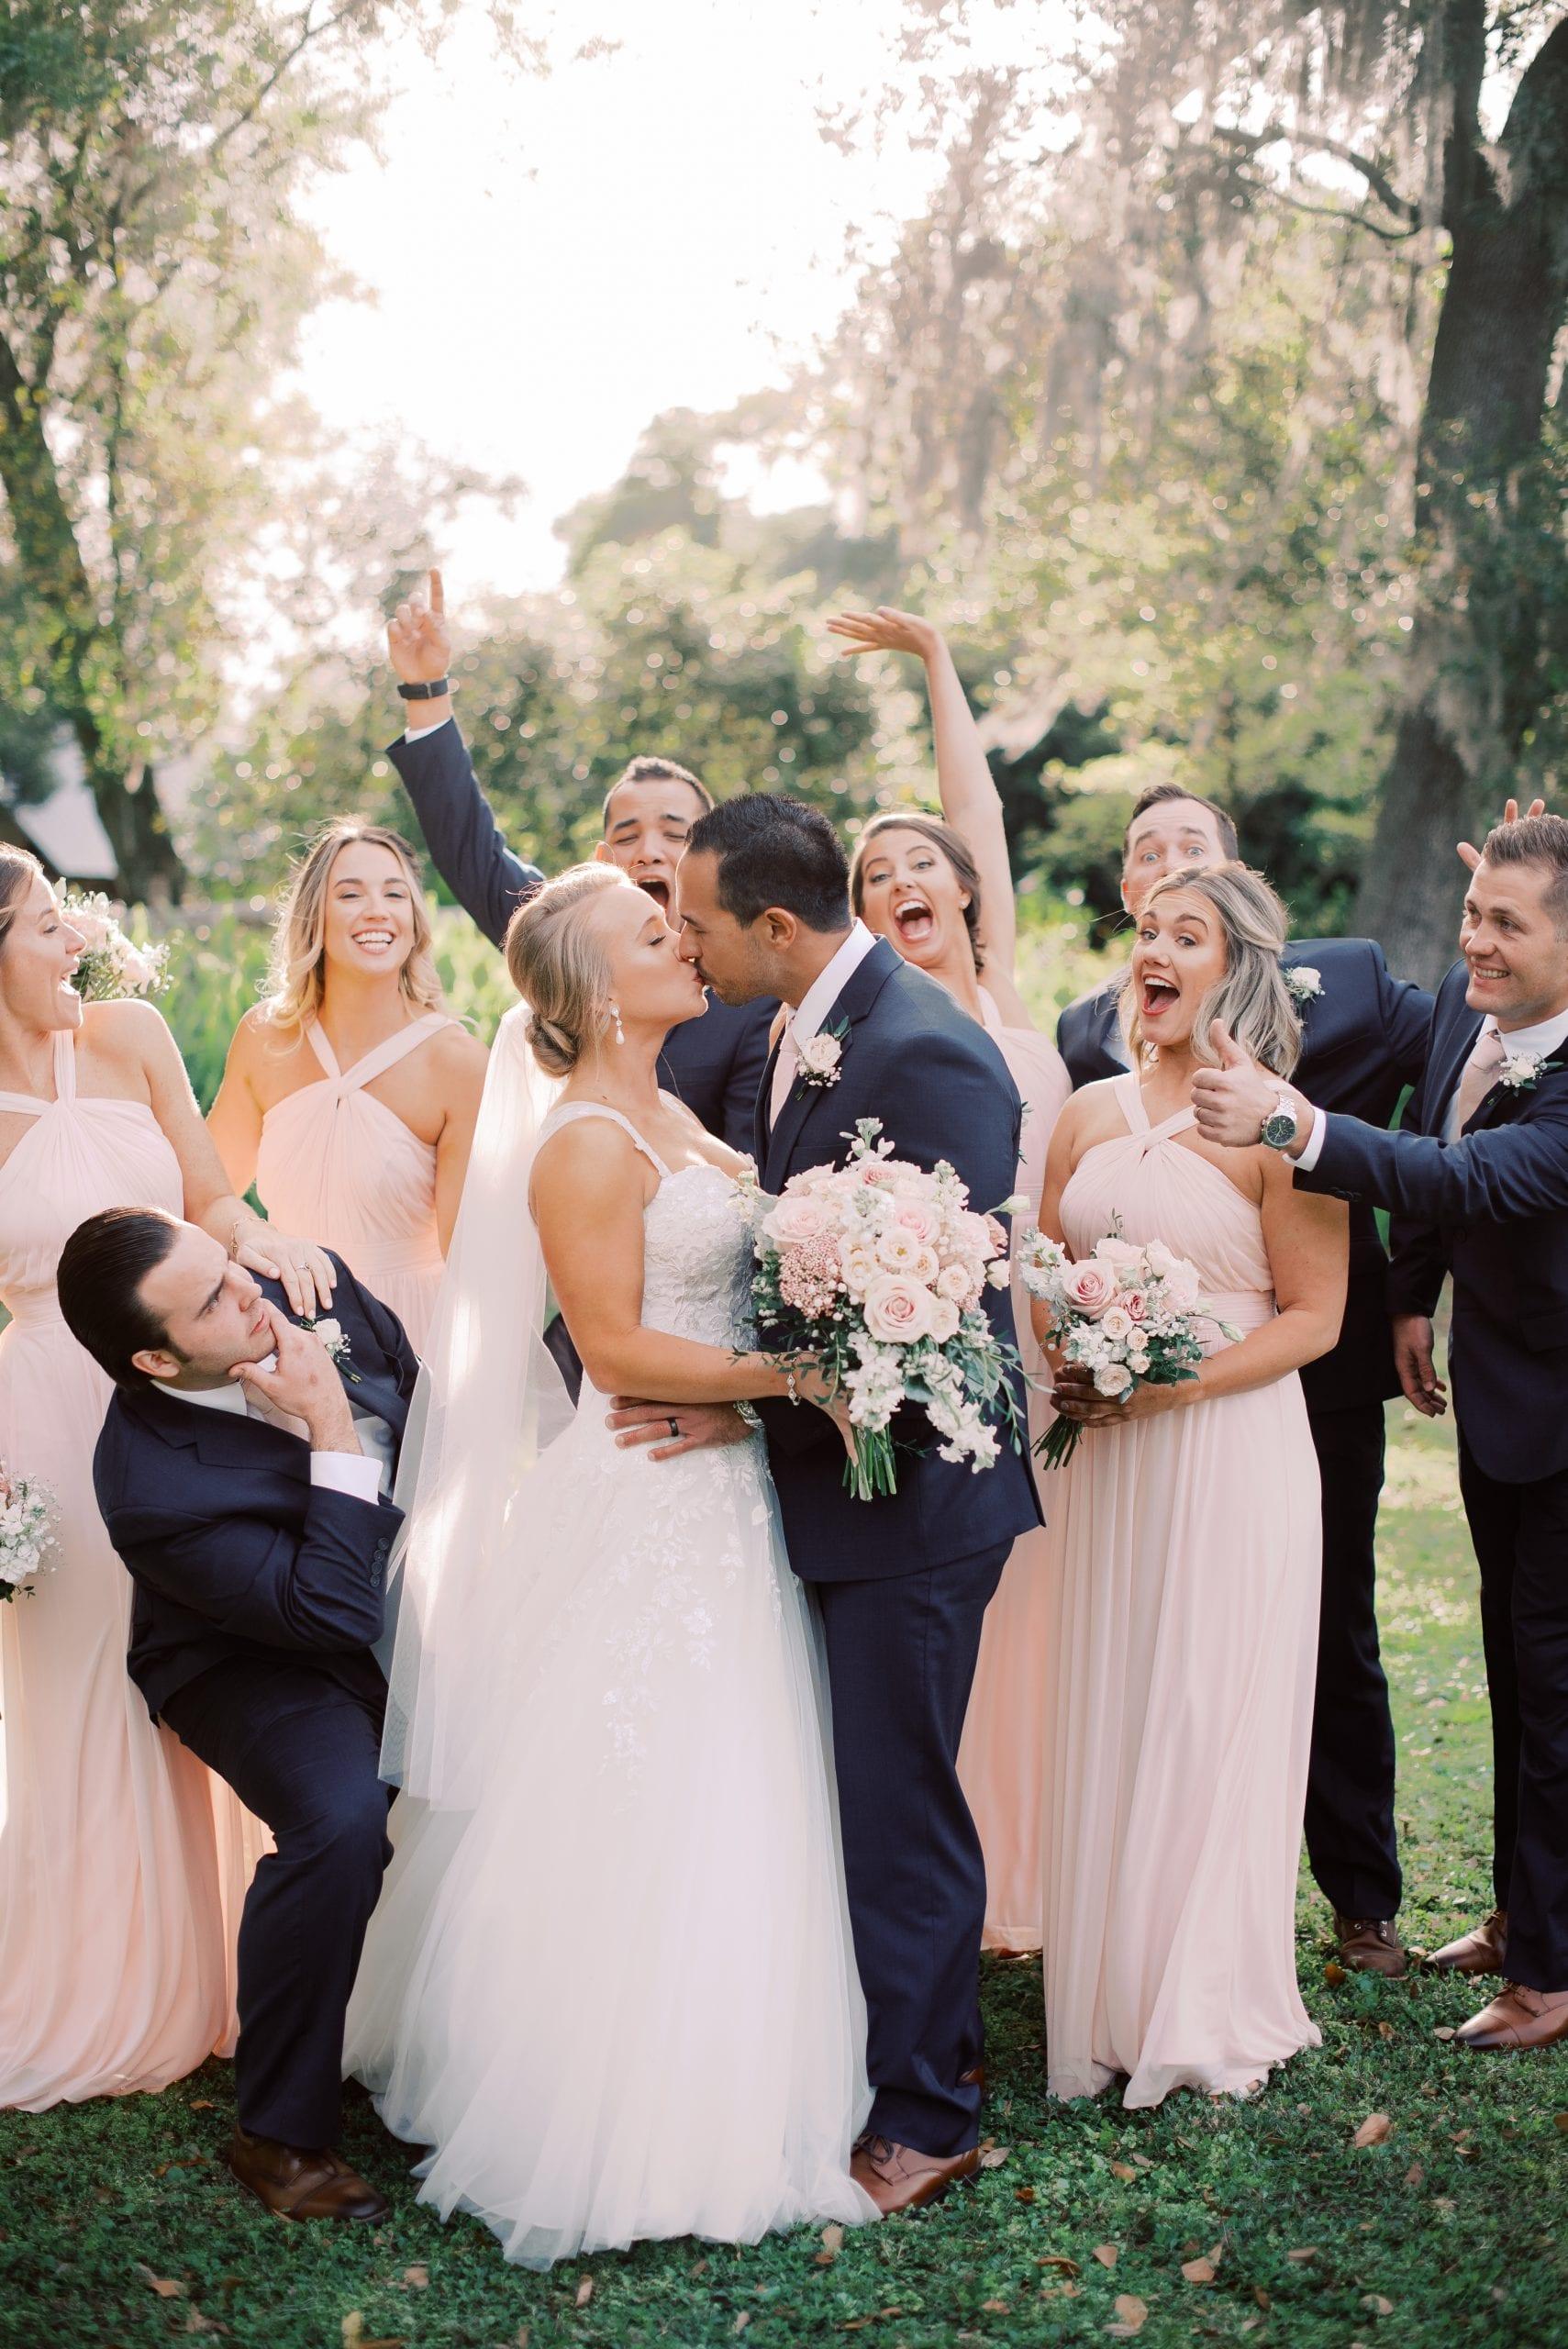 Mikaela + AJ'S Ultra Romantic Barn Wedding